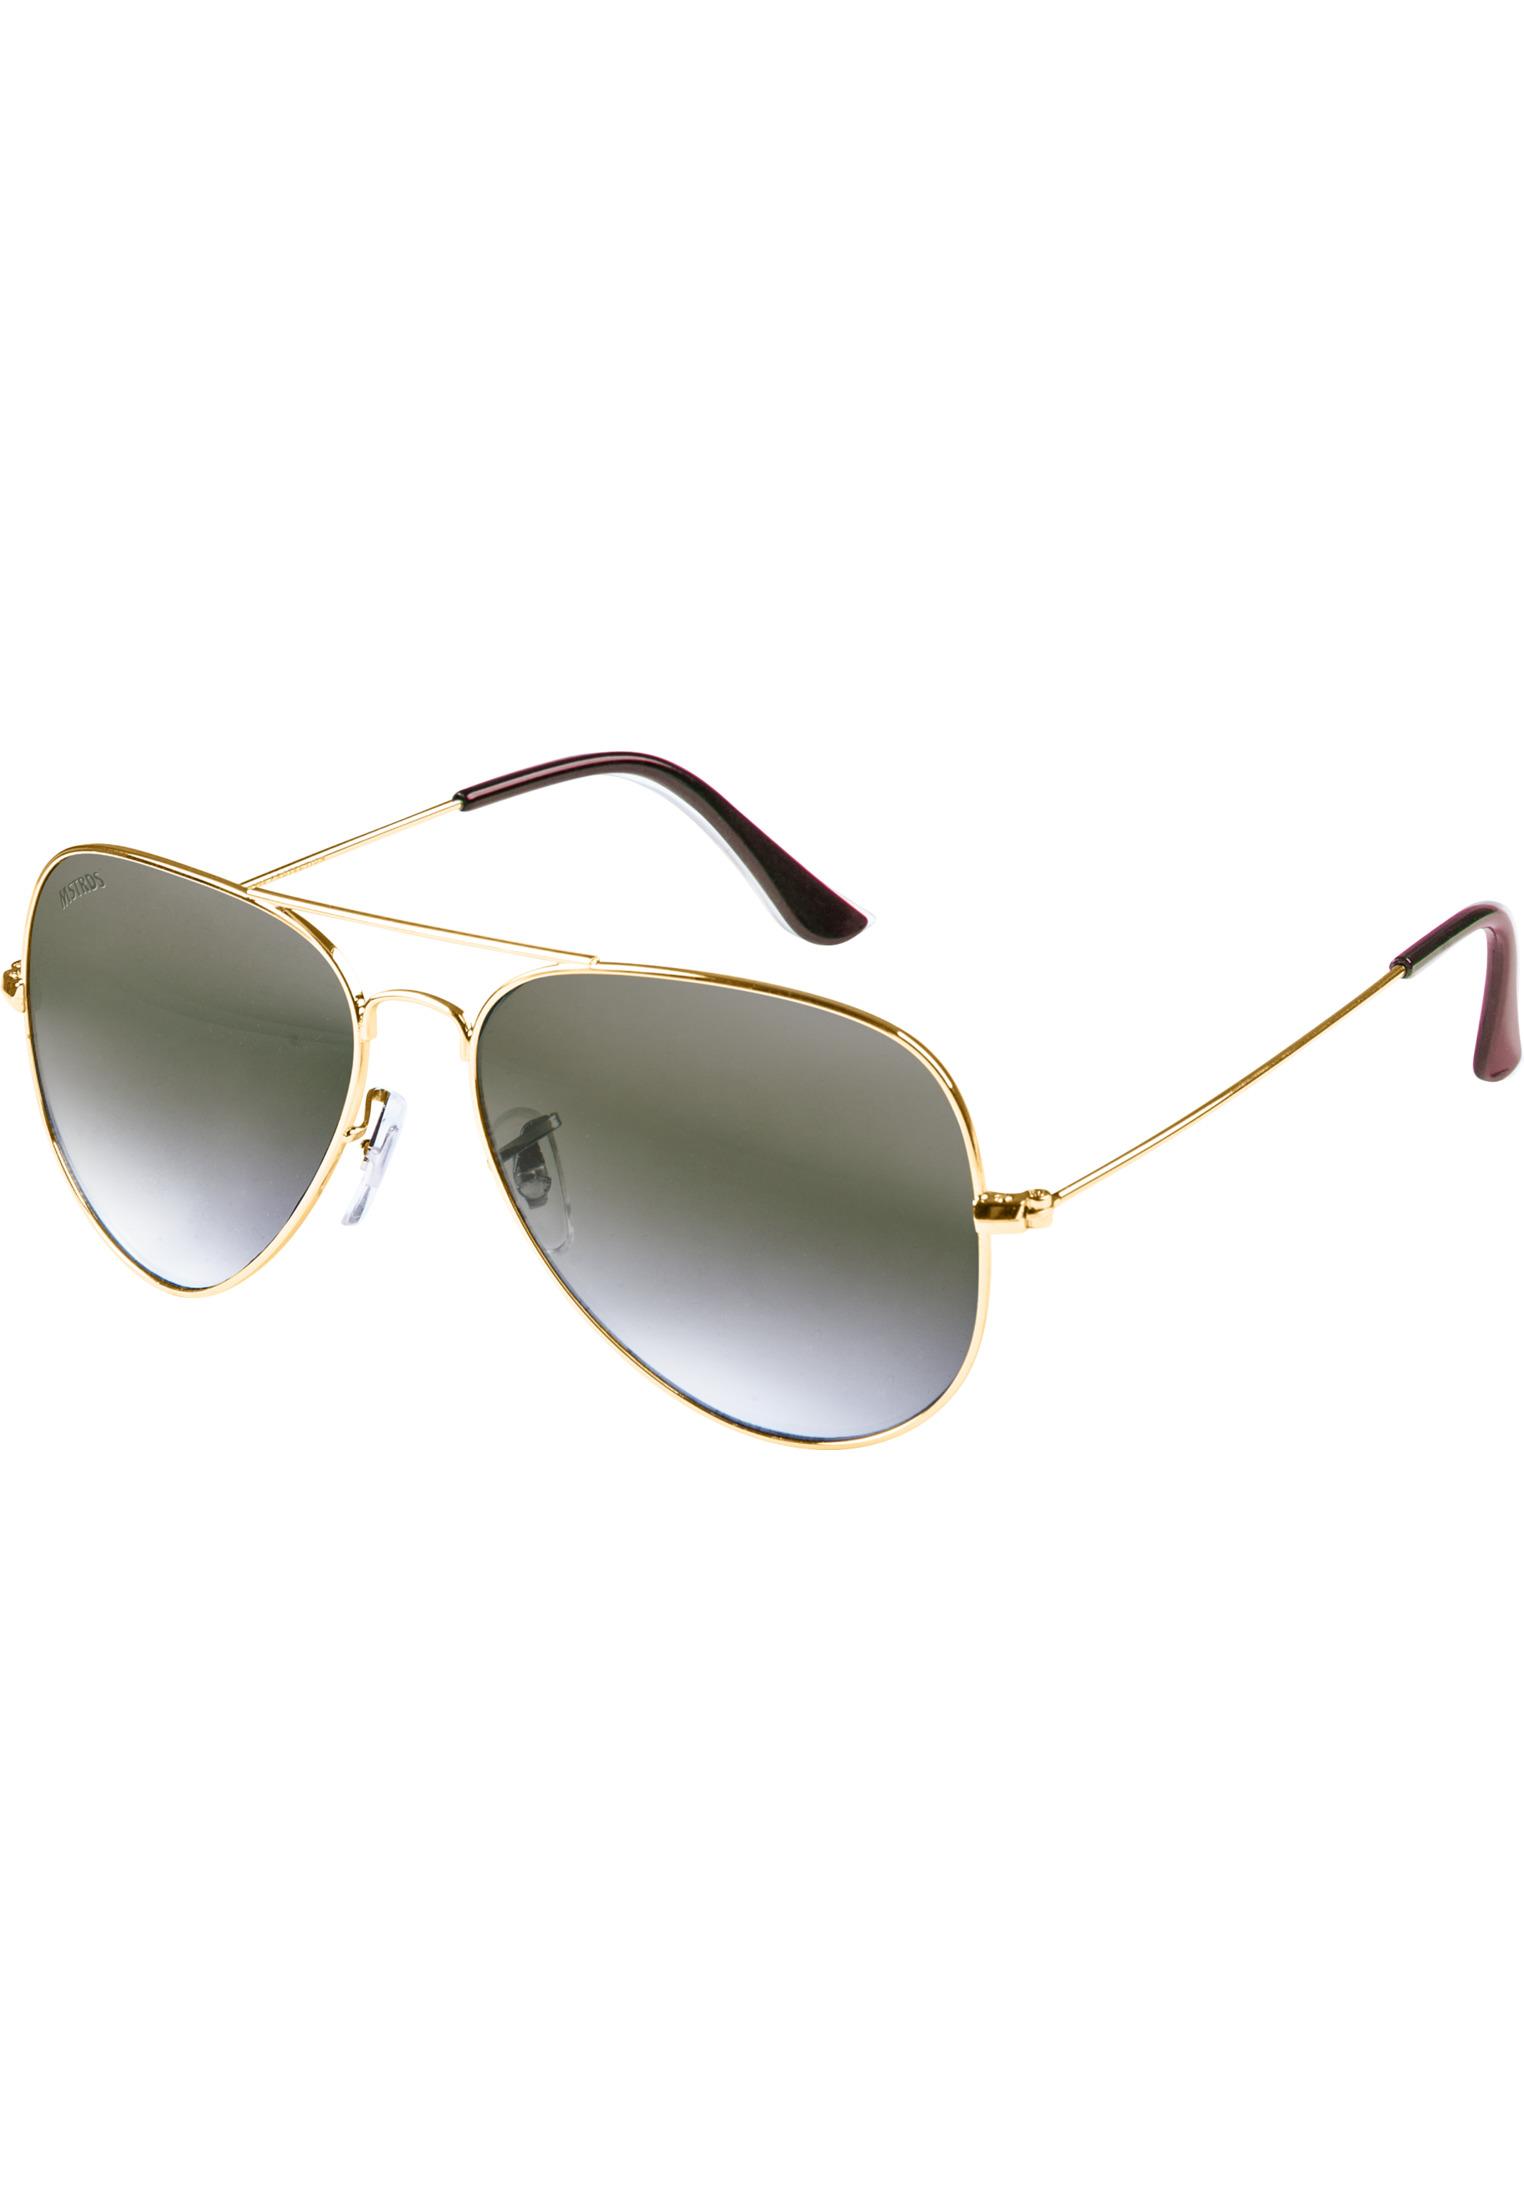 Urban Classics Sunglasses PureAv Youth gun/grey gQw2Jb5